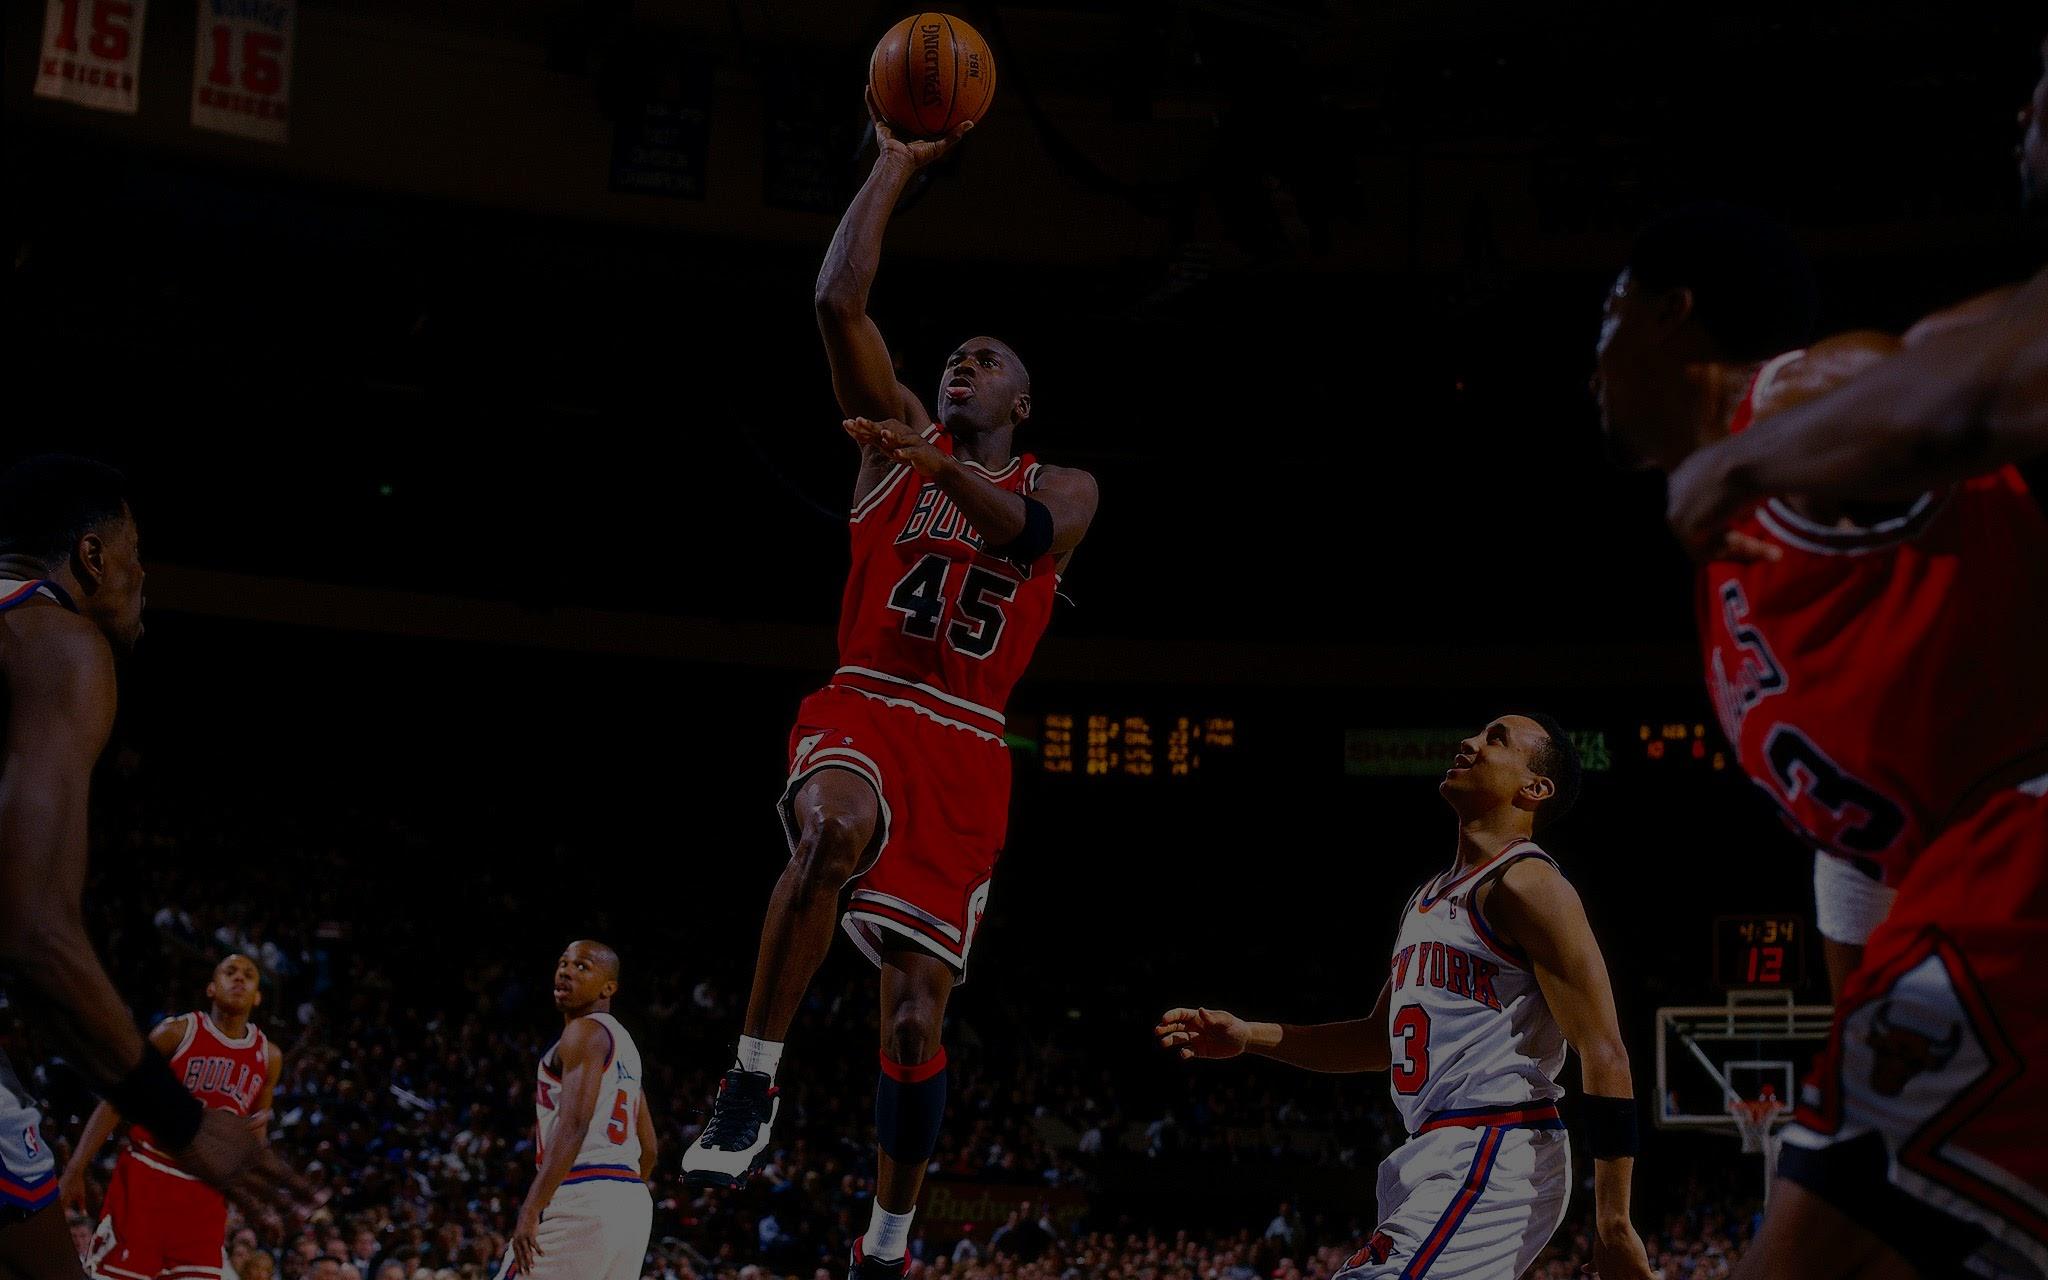 El secreto del éxito de la marca NBA